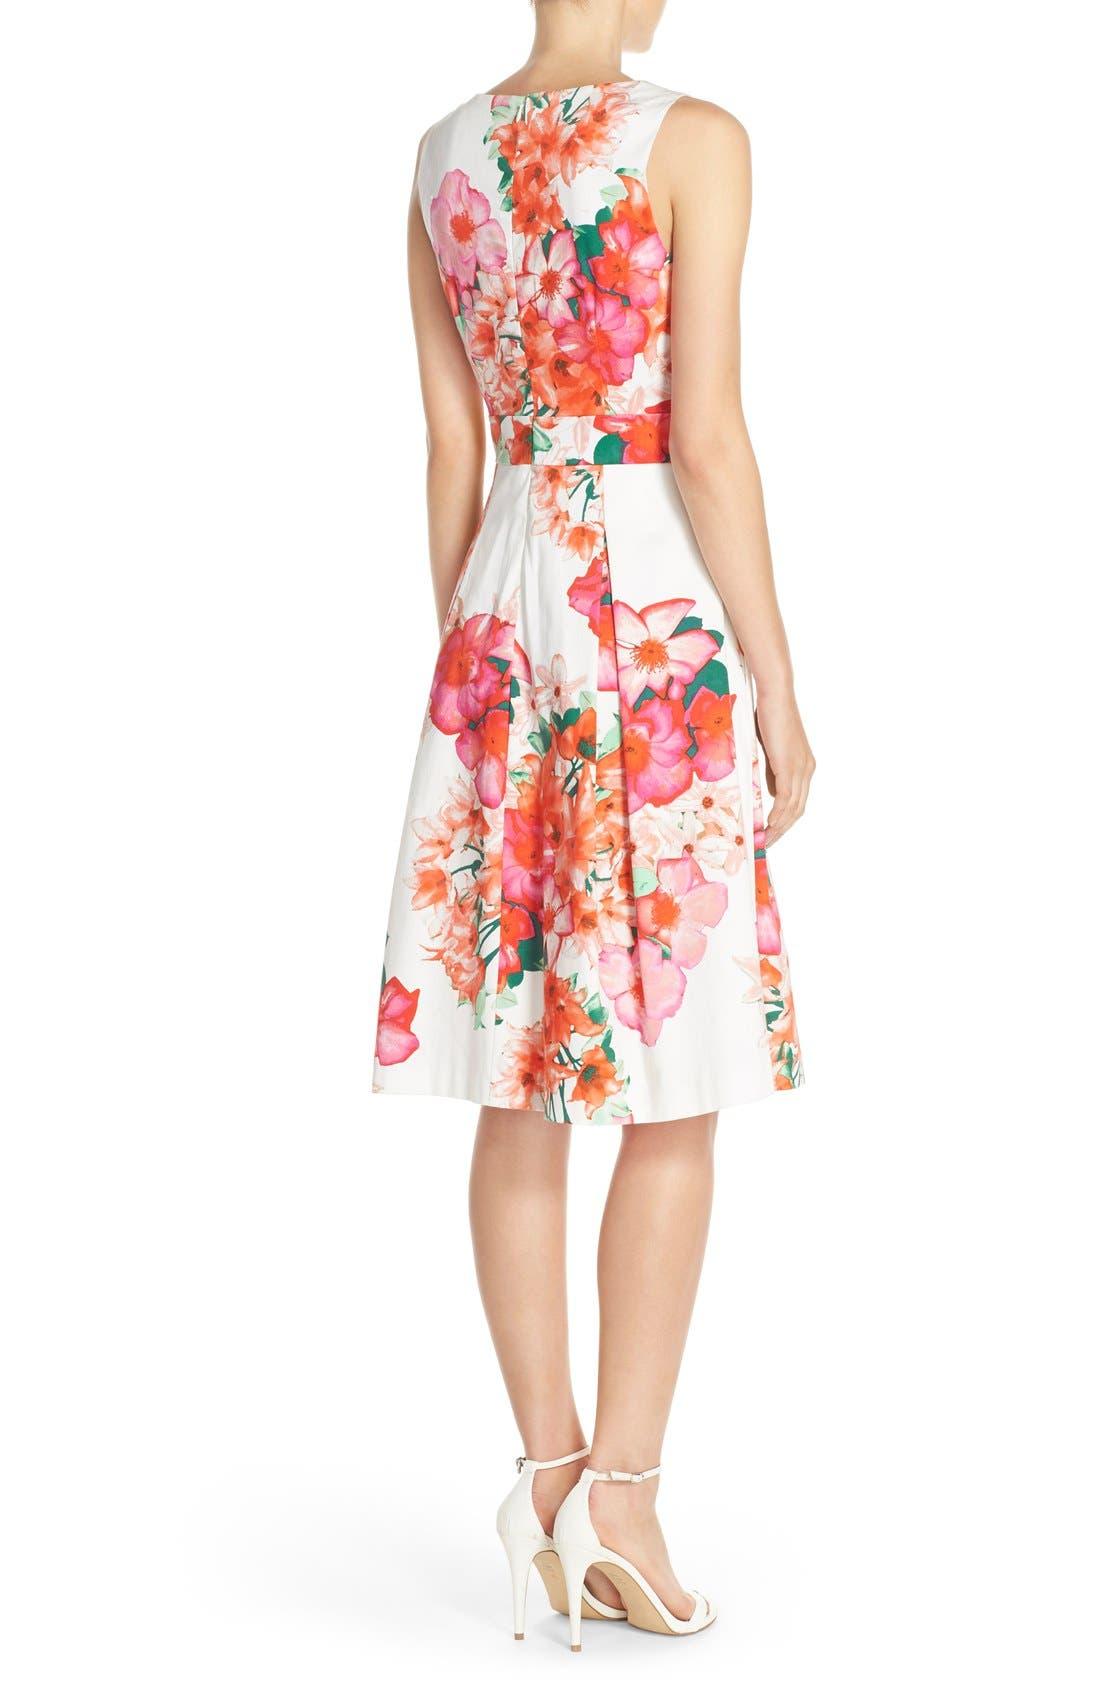 Floral Print Fit & Flare Dress,                             Alternate thumbnail 2, color,                             Pink/ Orange/ Green